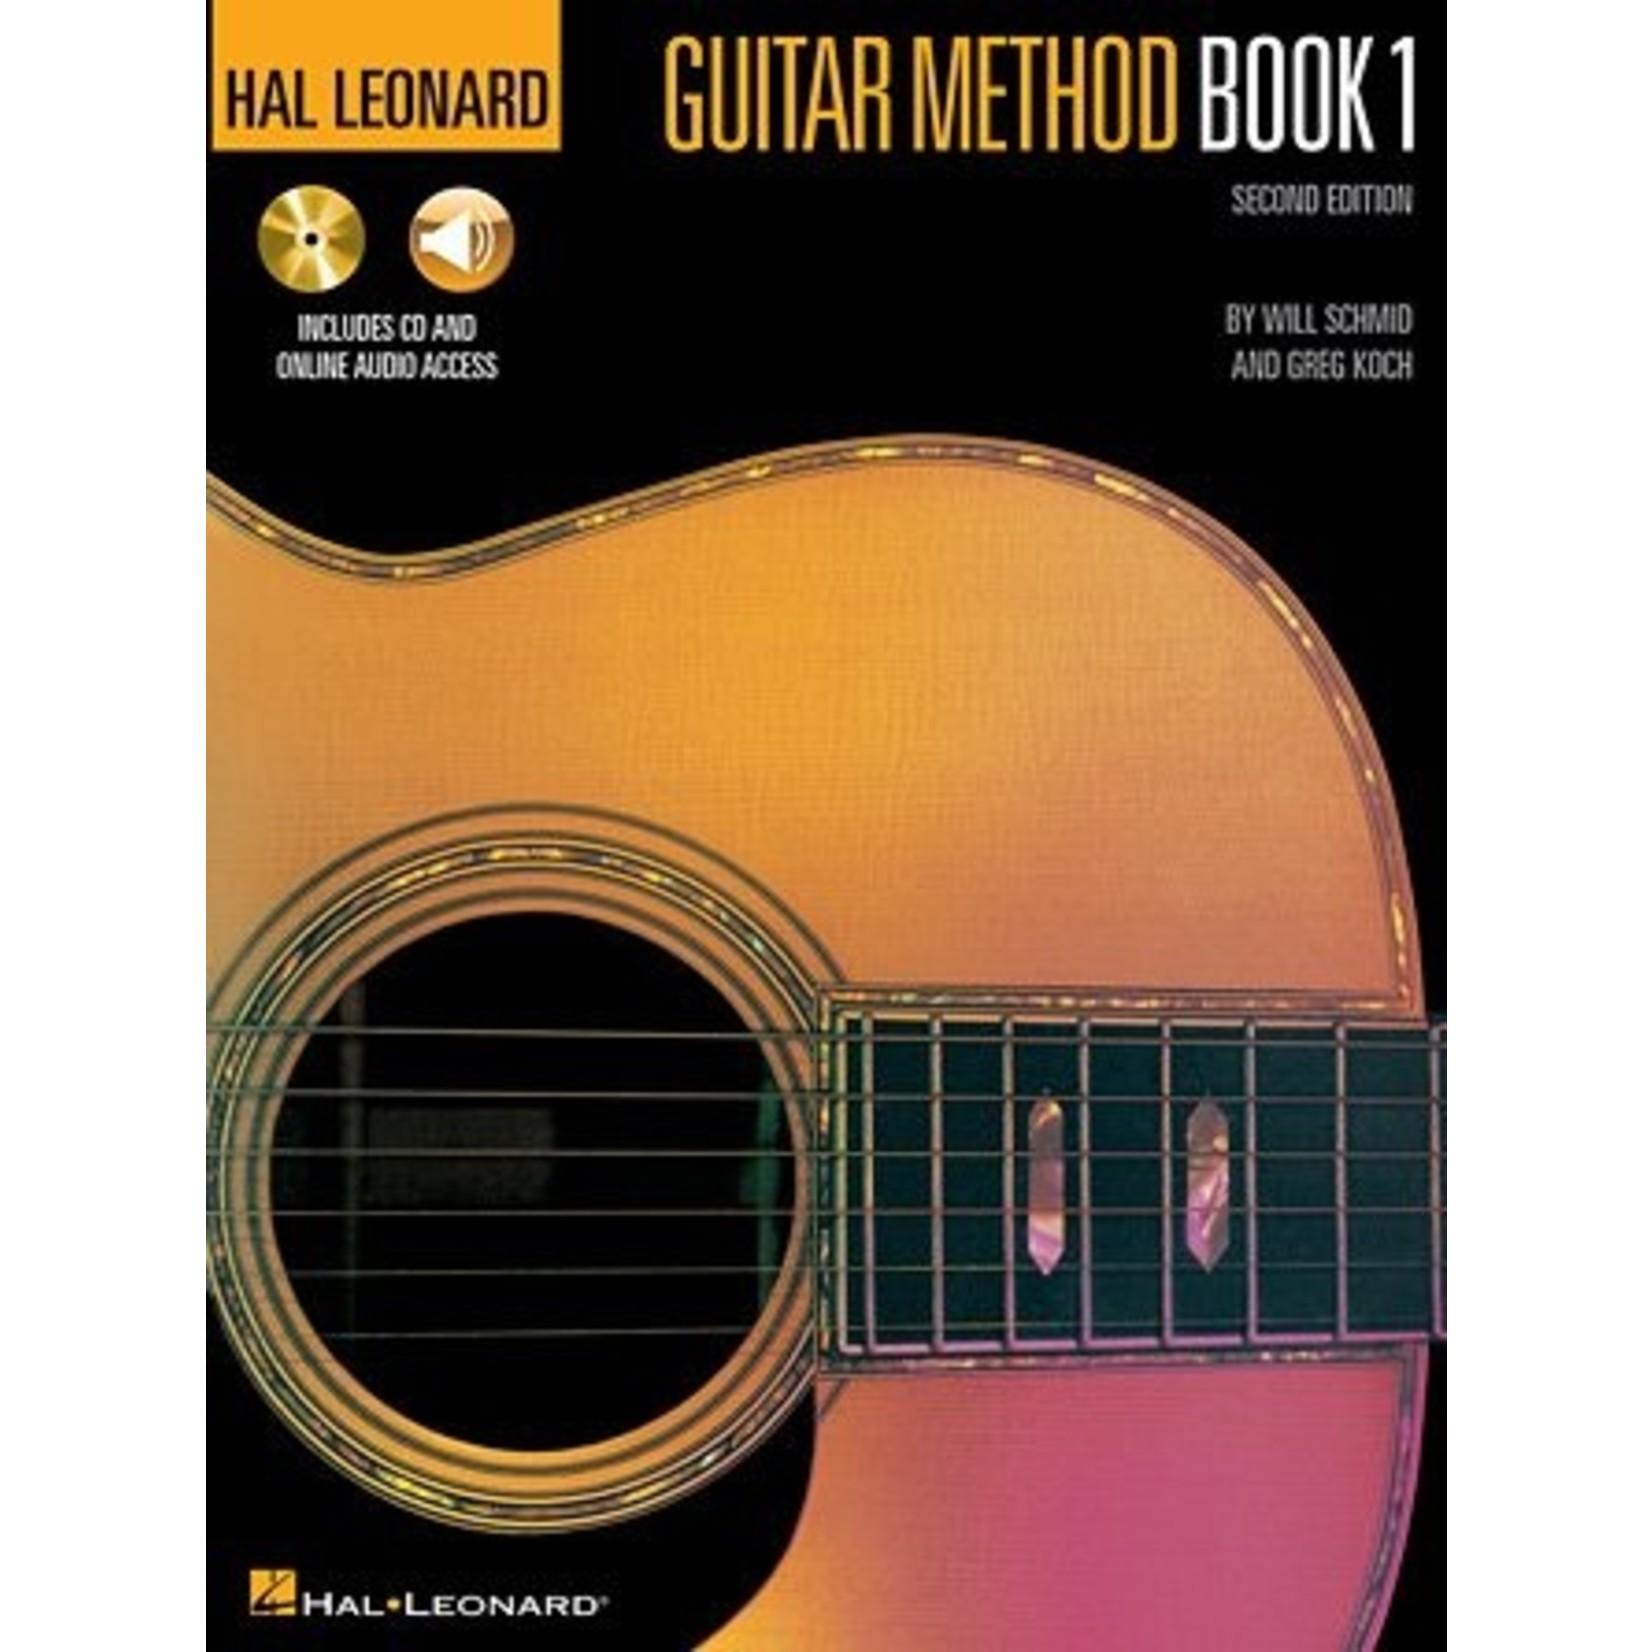 Hal Leonard Hal Leonard Guitar Method Book 1 (with audio)